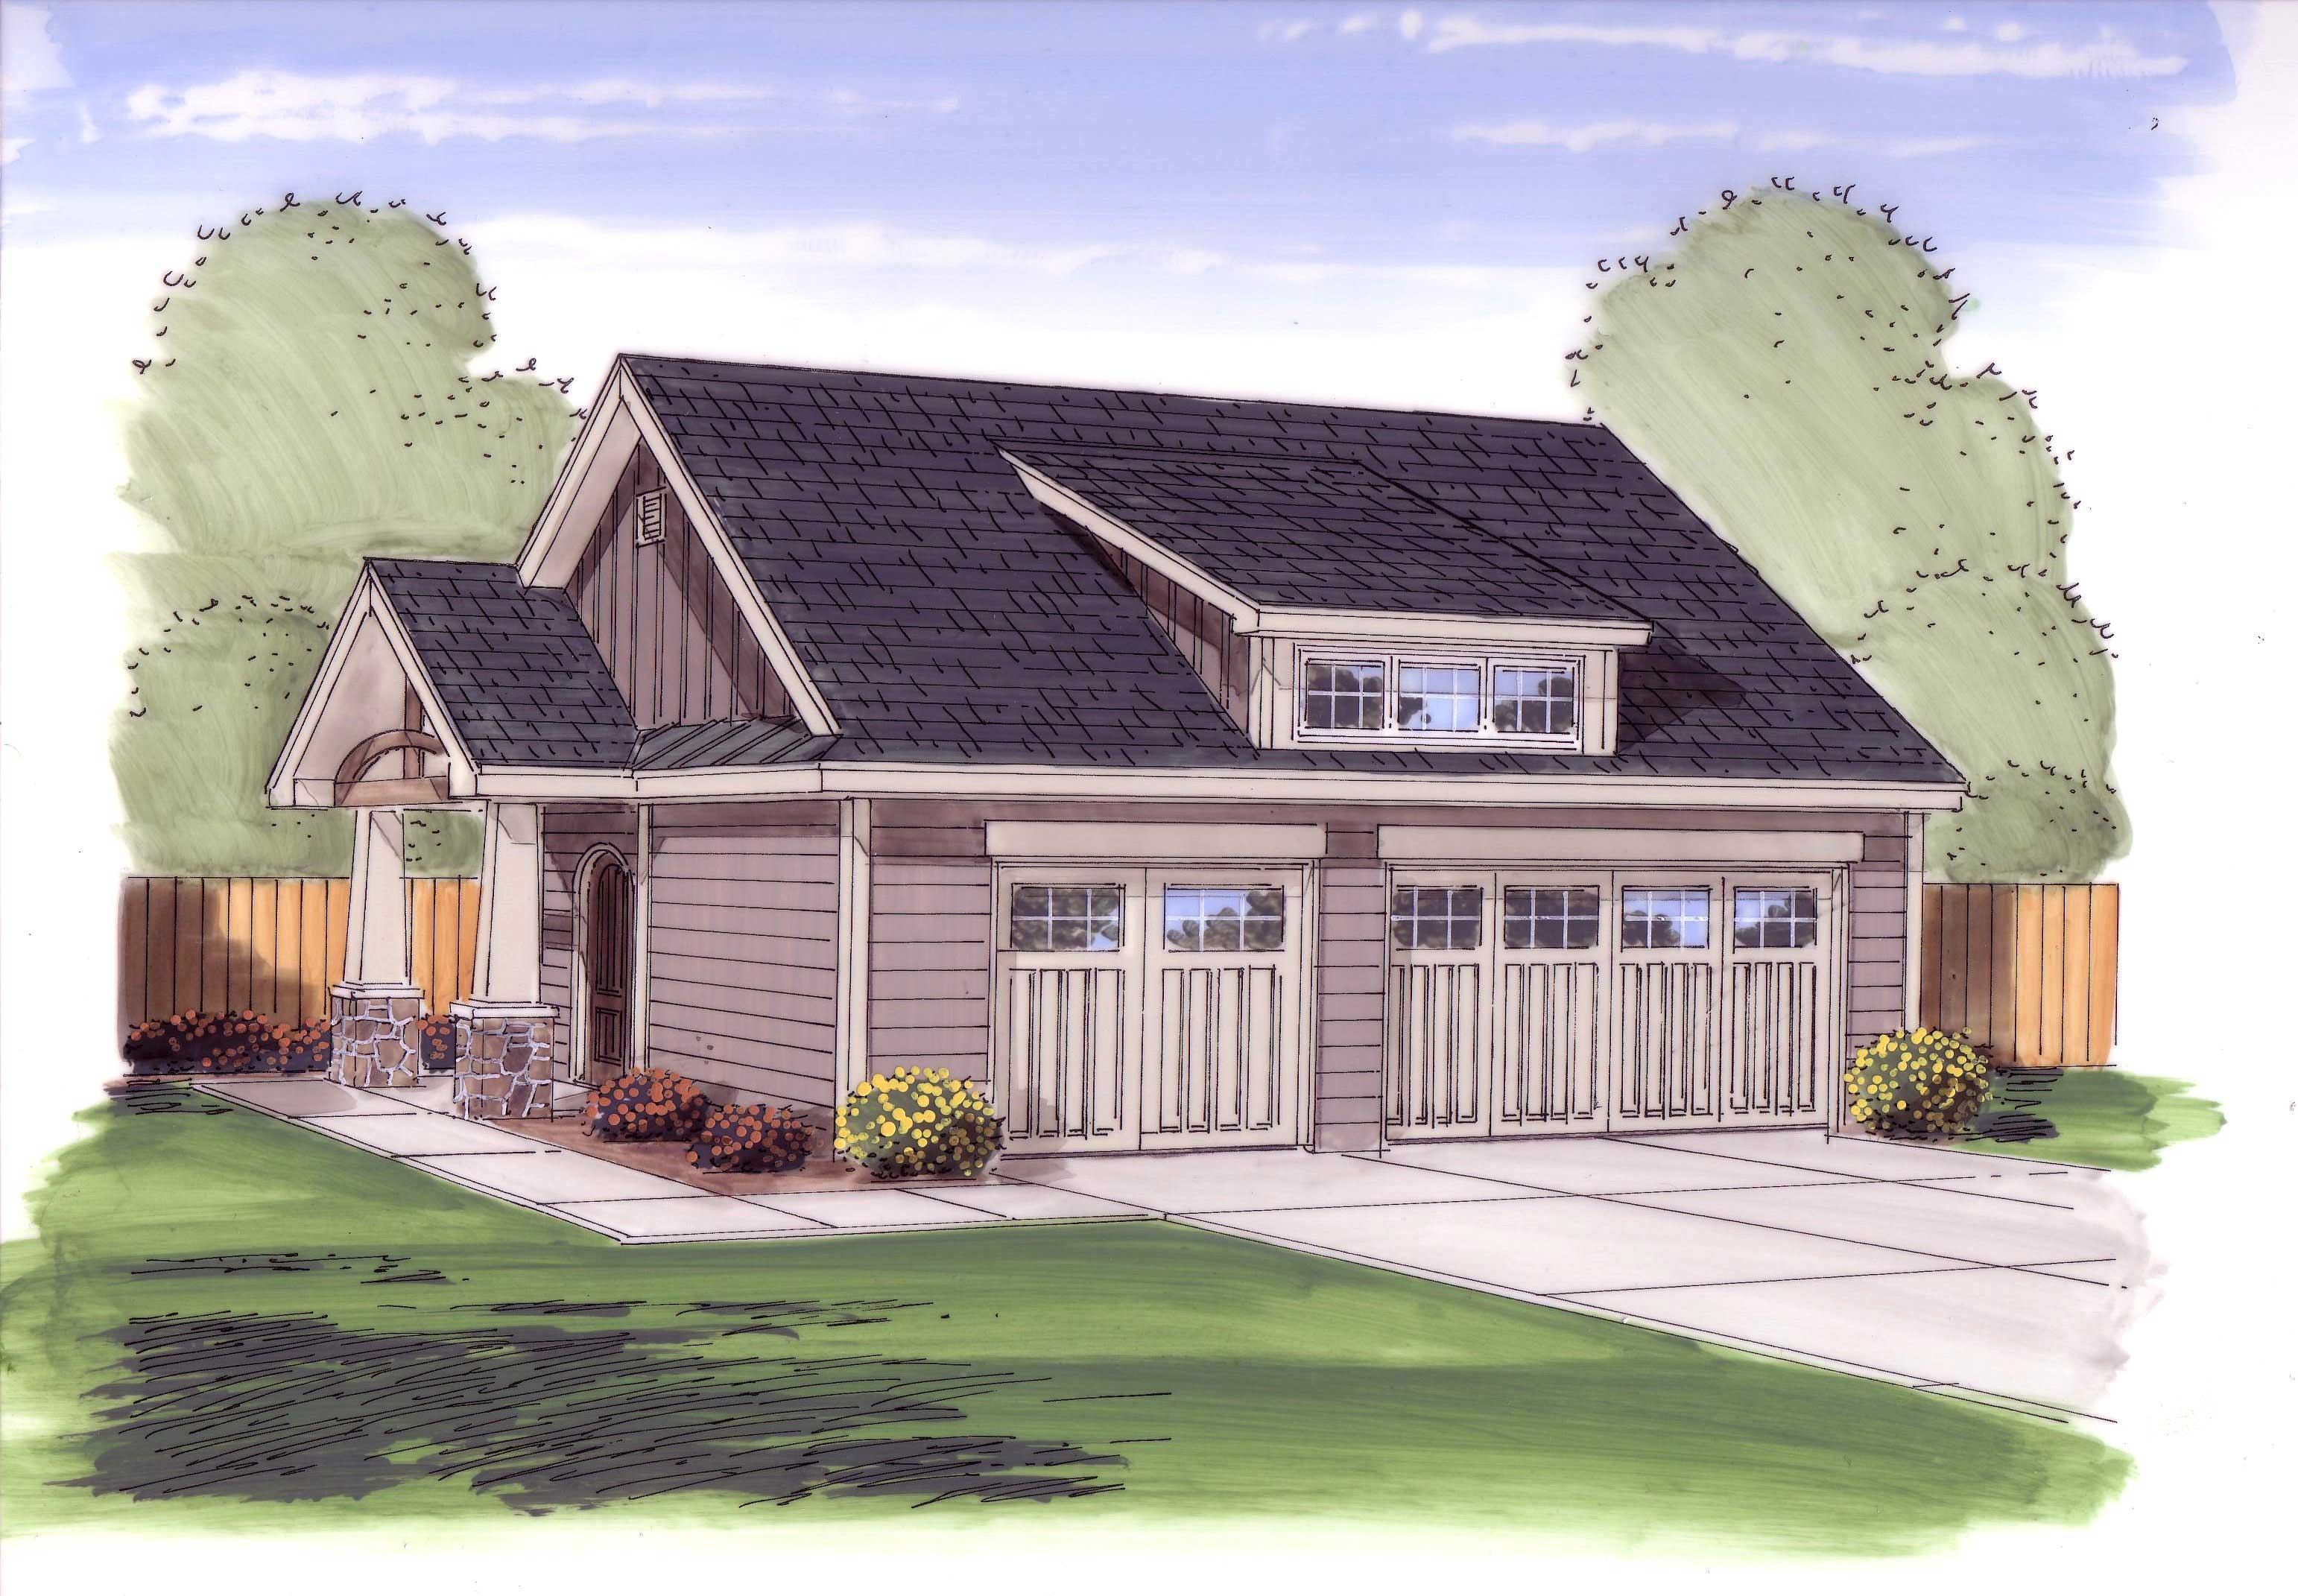 Garage with 3 car 770 sq ft plan 100 1053 for 770 plan